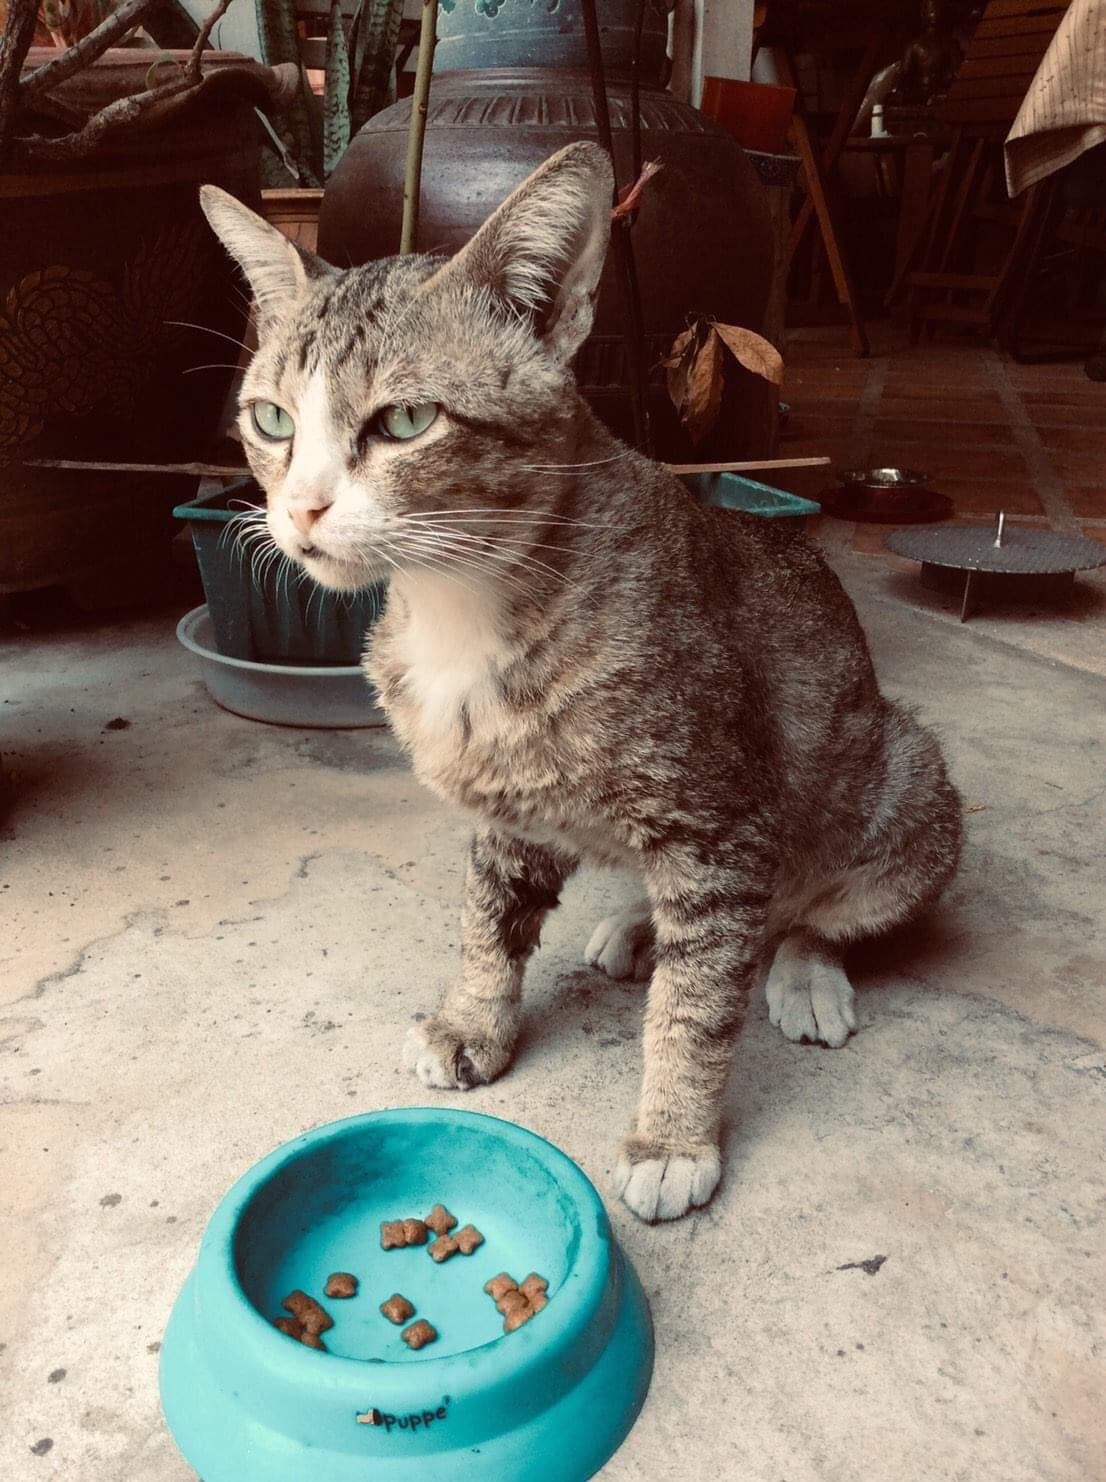 Bad mood elder cat during his lunch😾 (  เจ้าเหมียวแก่อารมณ์บูดตอนมื้อเที่ยง 😾)